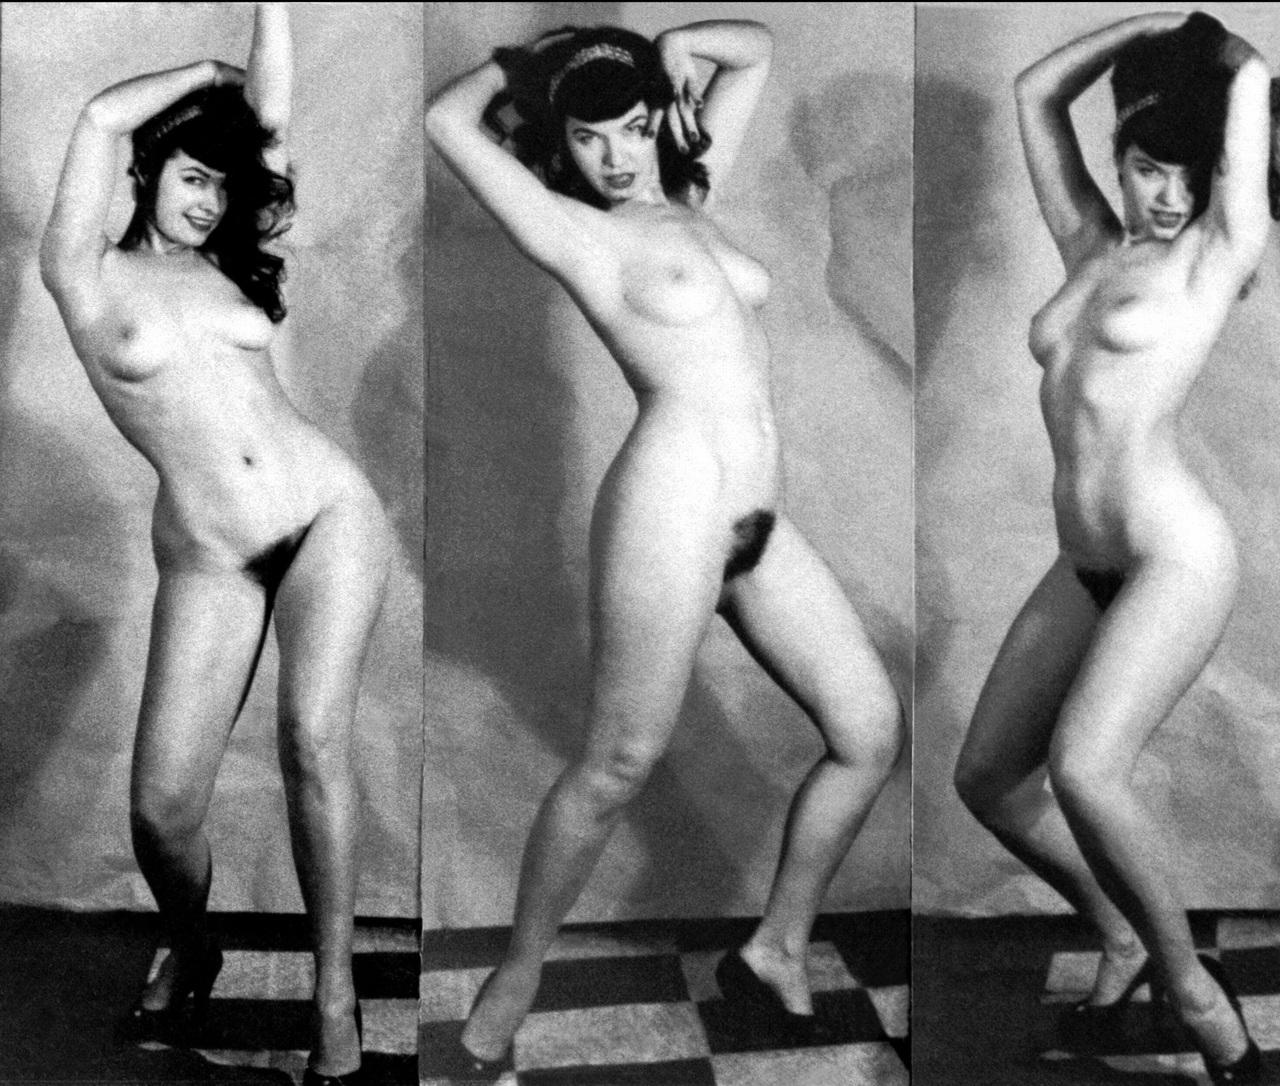 Bettie nibblez brown nude — photo 9